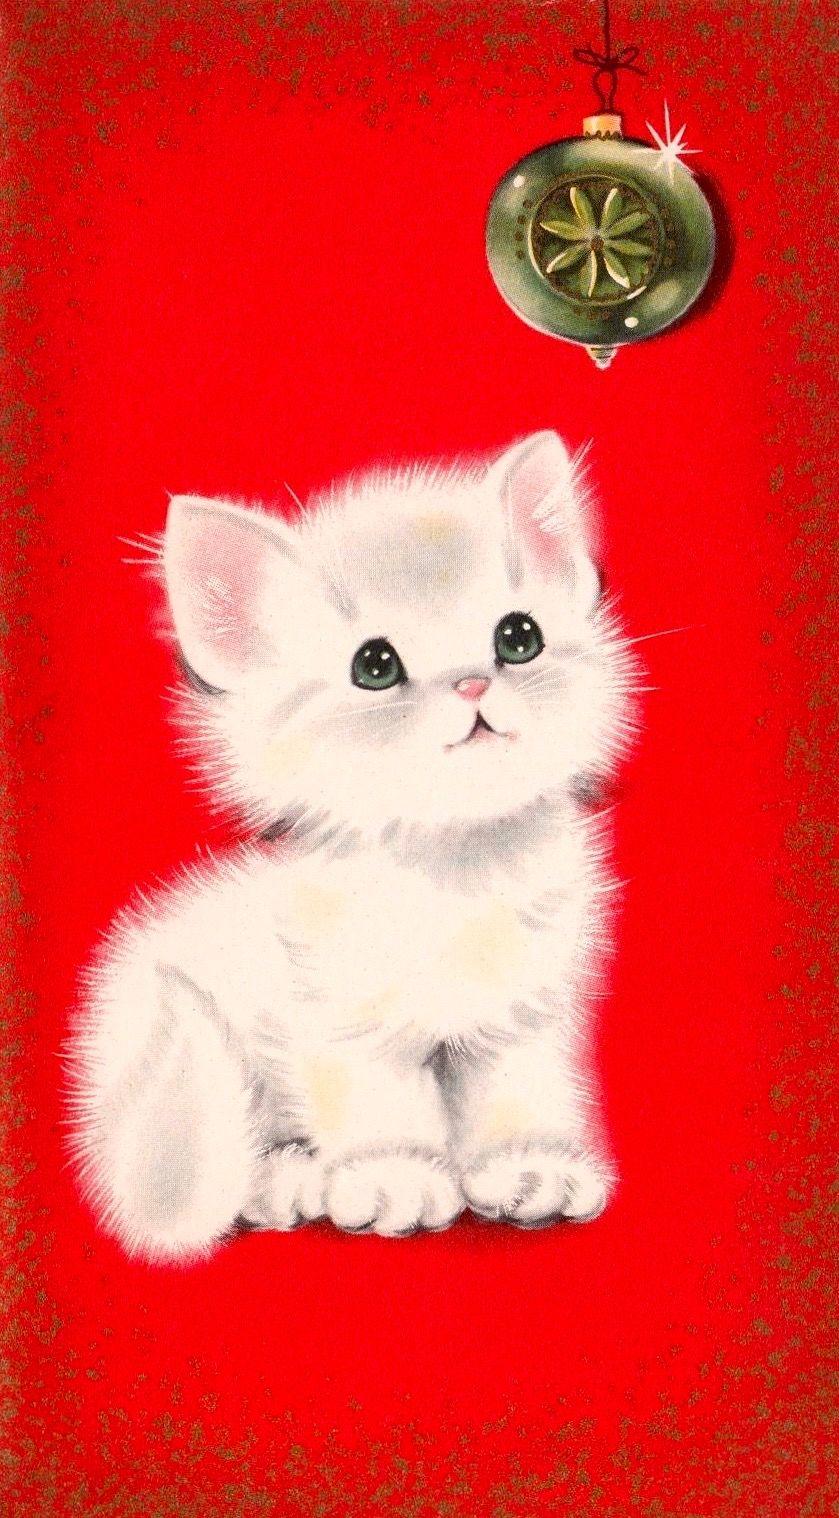 Baby Kitten Christmas Kitten Vintage Christmas Card Retro Christmas Card Bichinho Aquarela Fofinhos